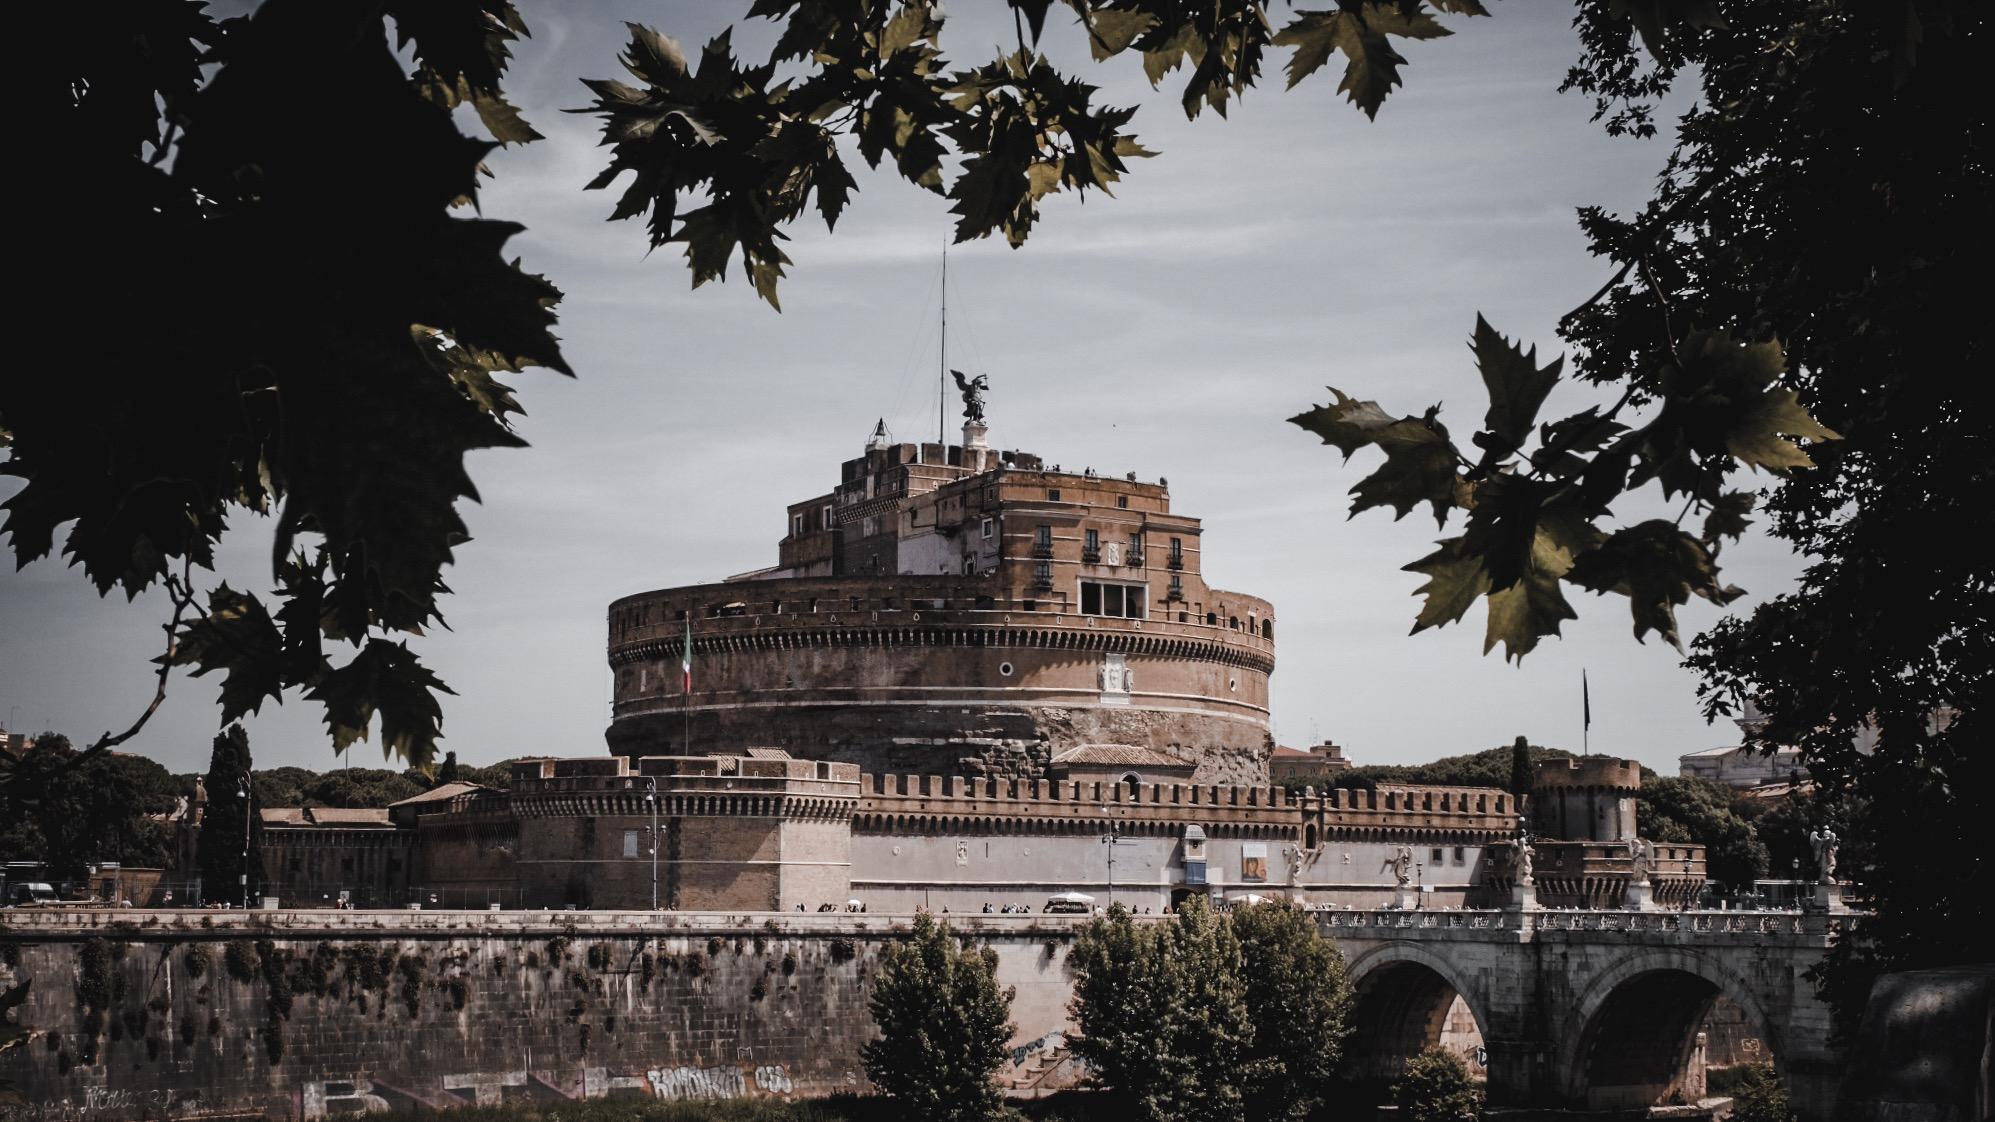 Castel Saint Angelo, Italy